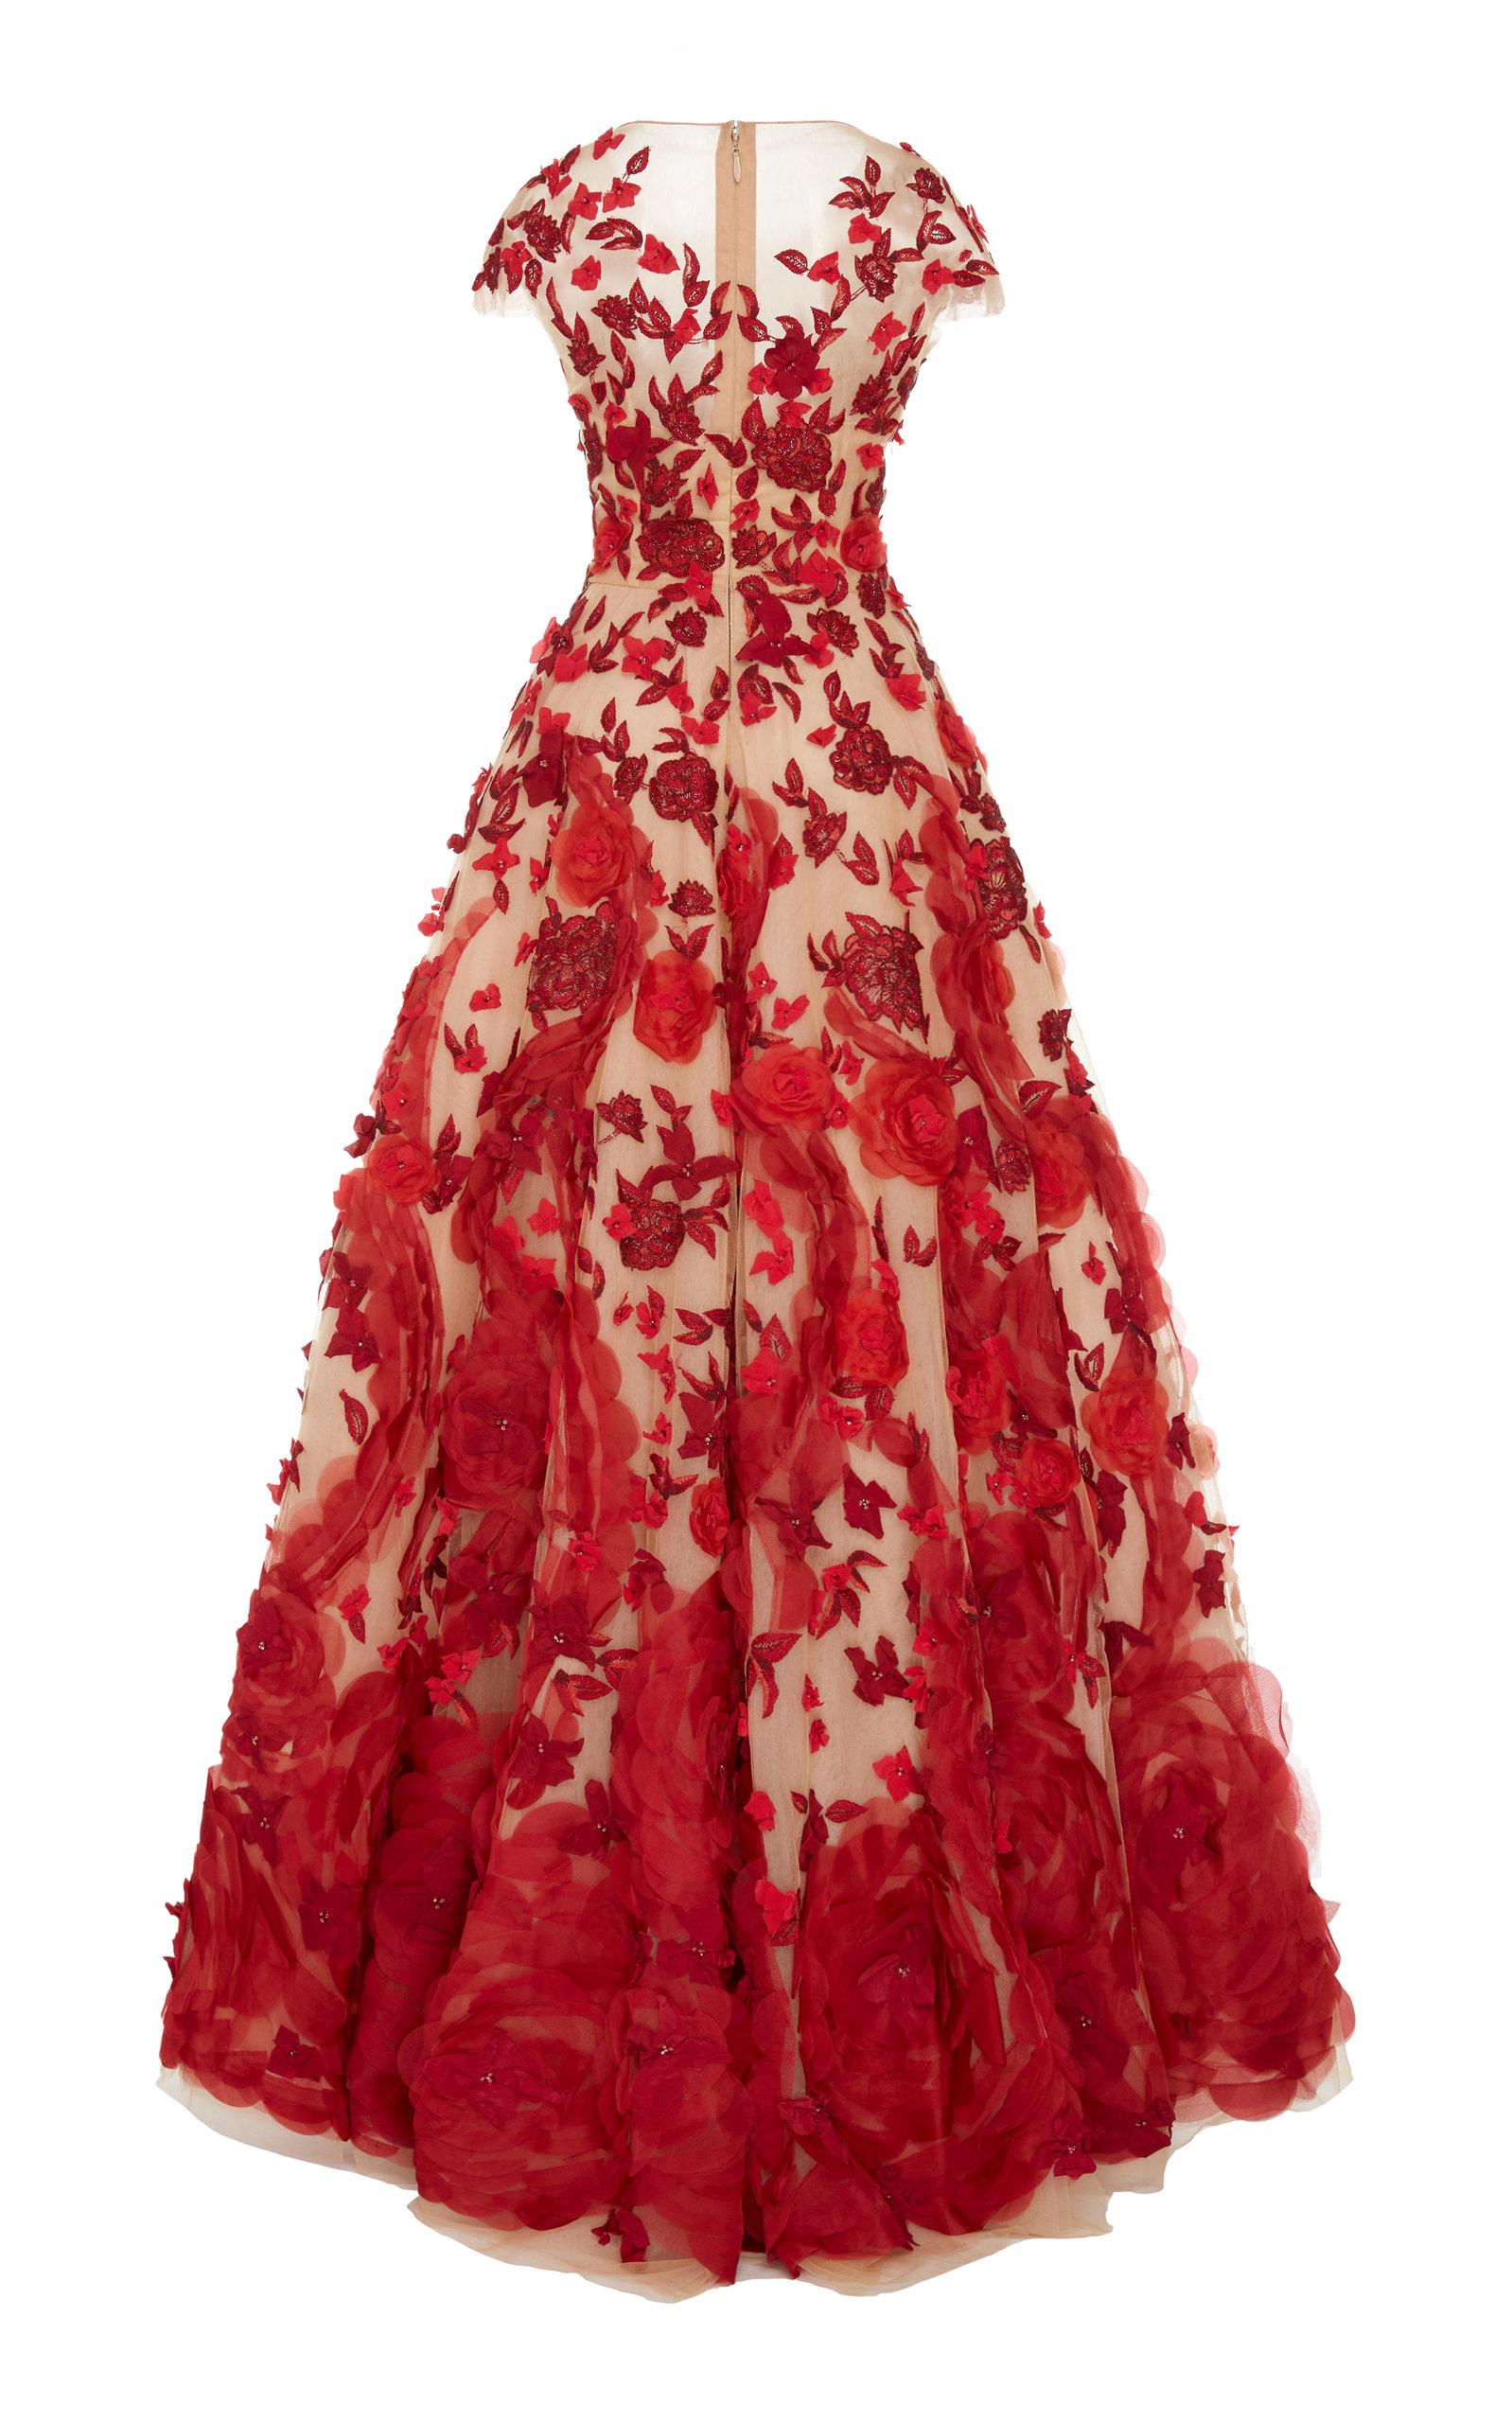 Illusion V Neck Ballgown With Silk Organza Flowers By Moda Operandi